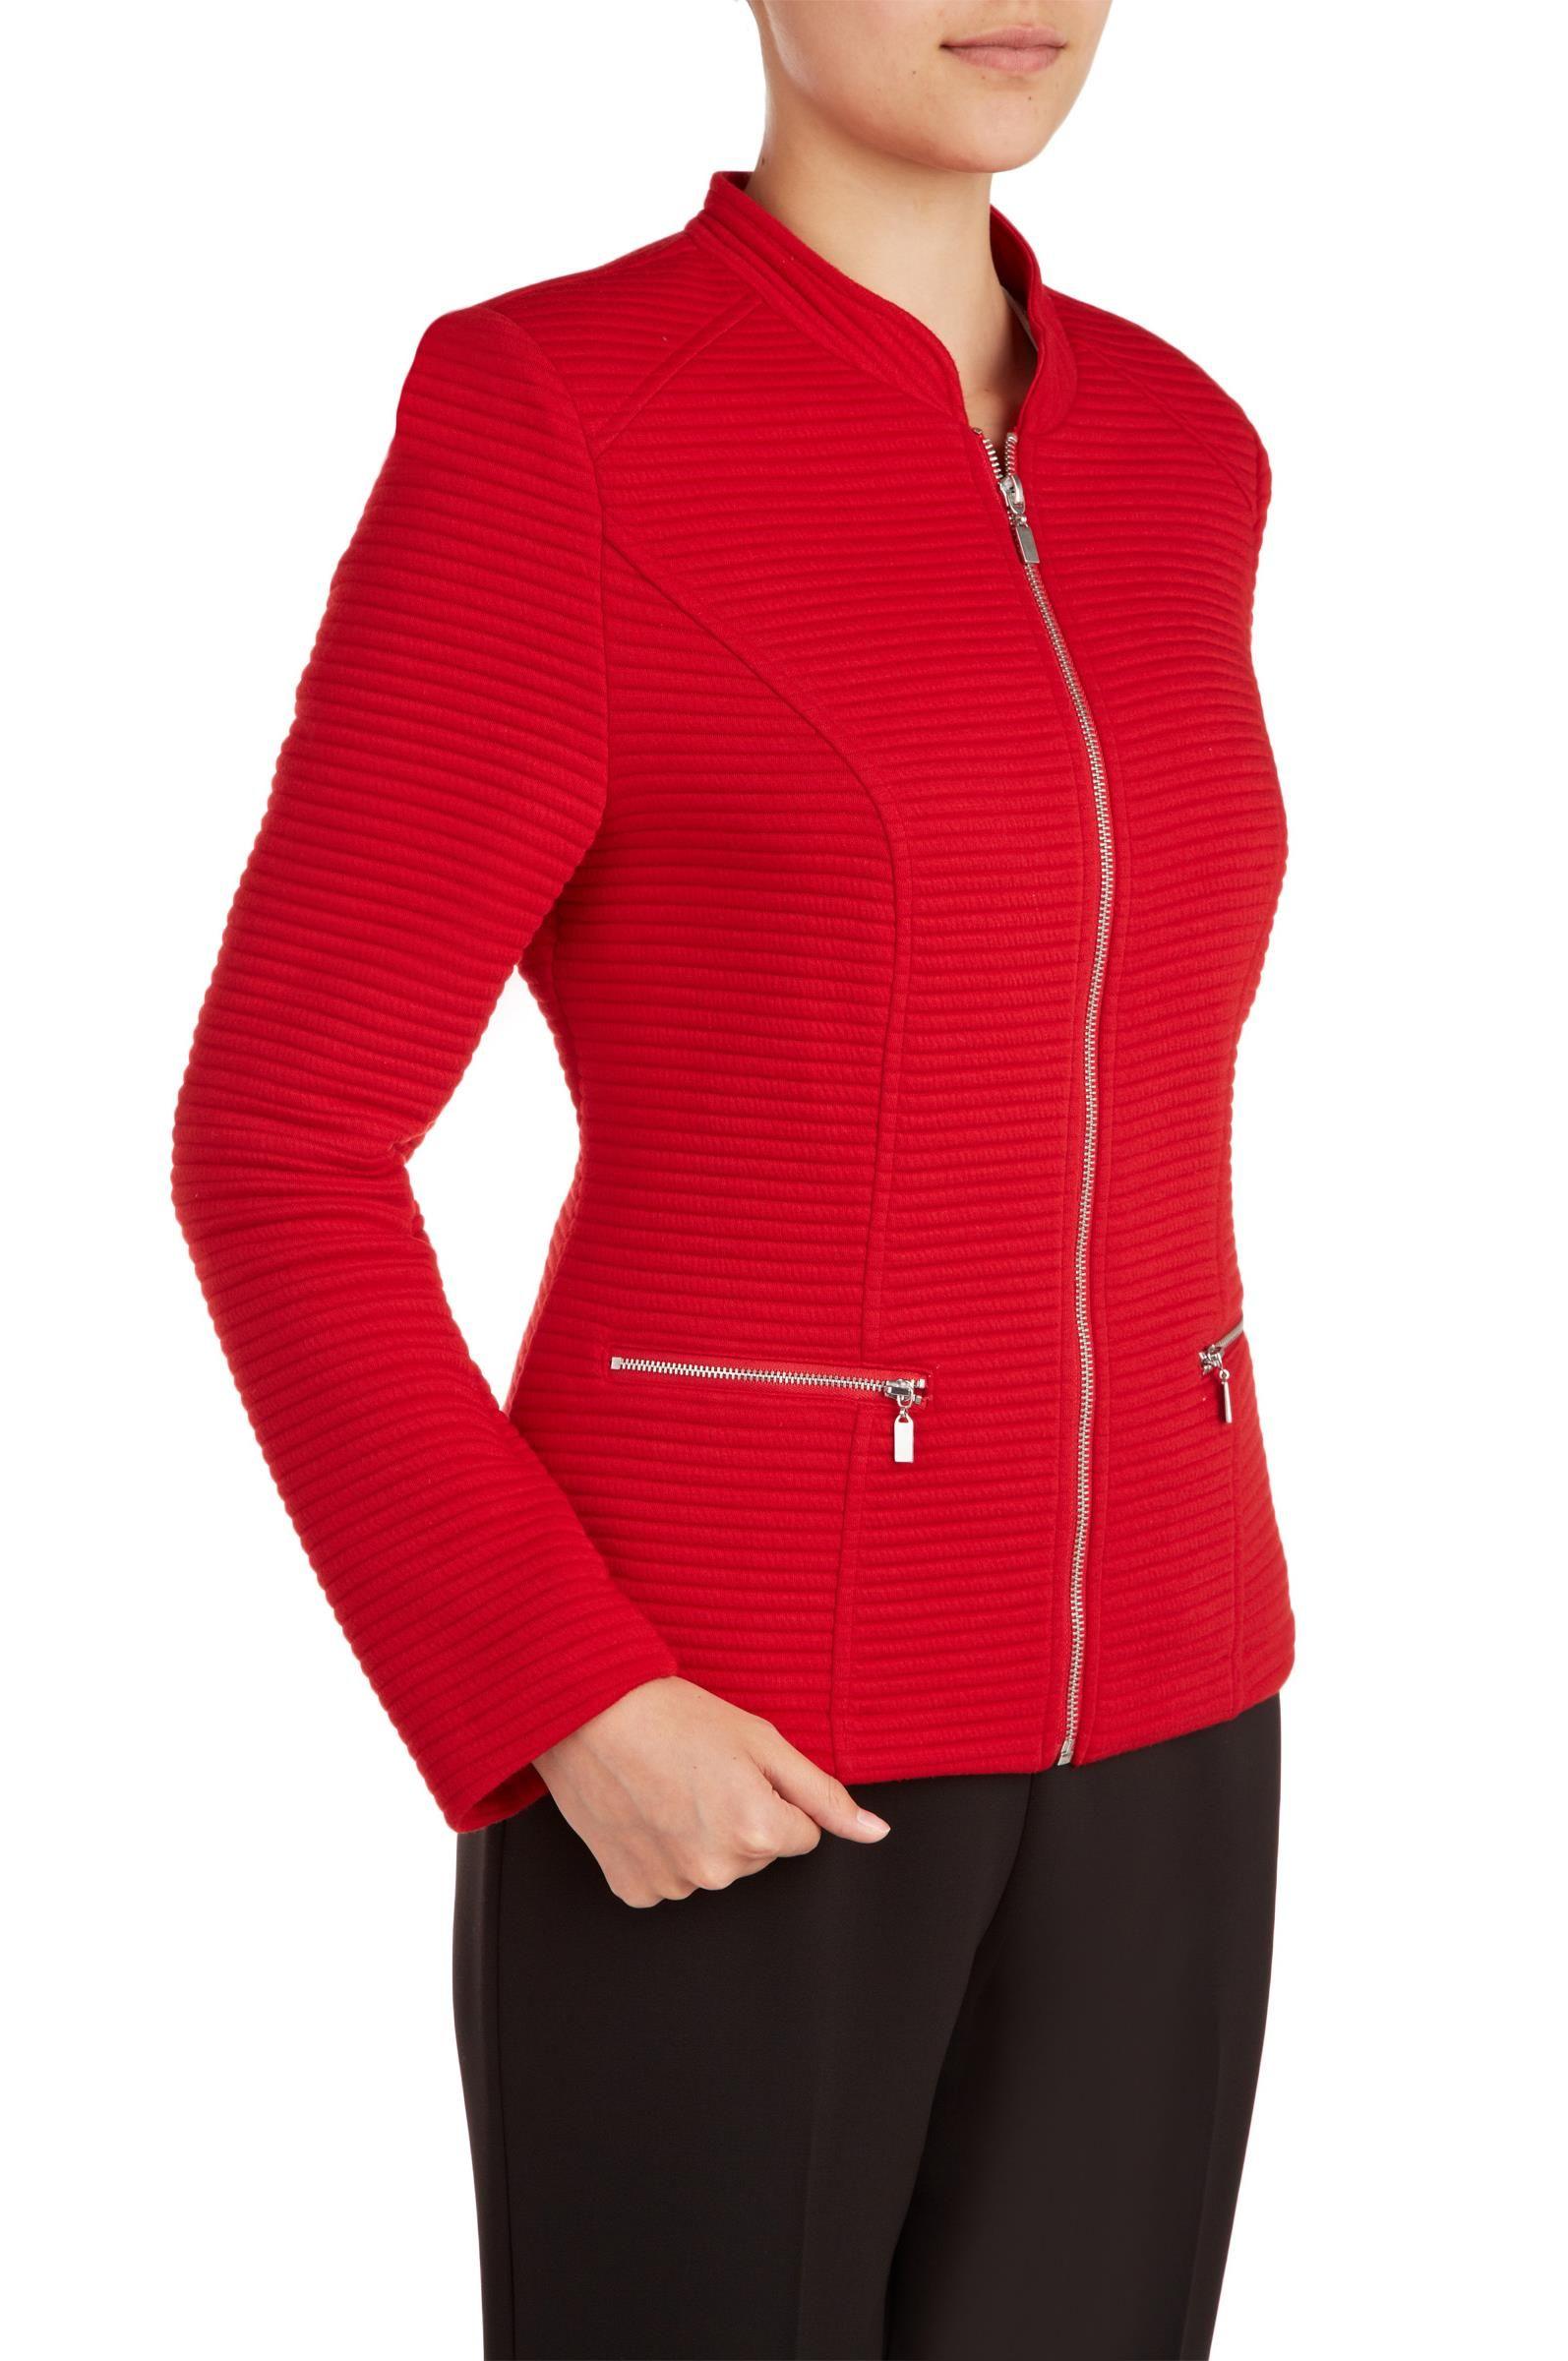 TanJay-Regular-Long Sleeve Jacket